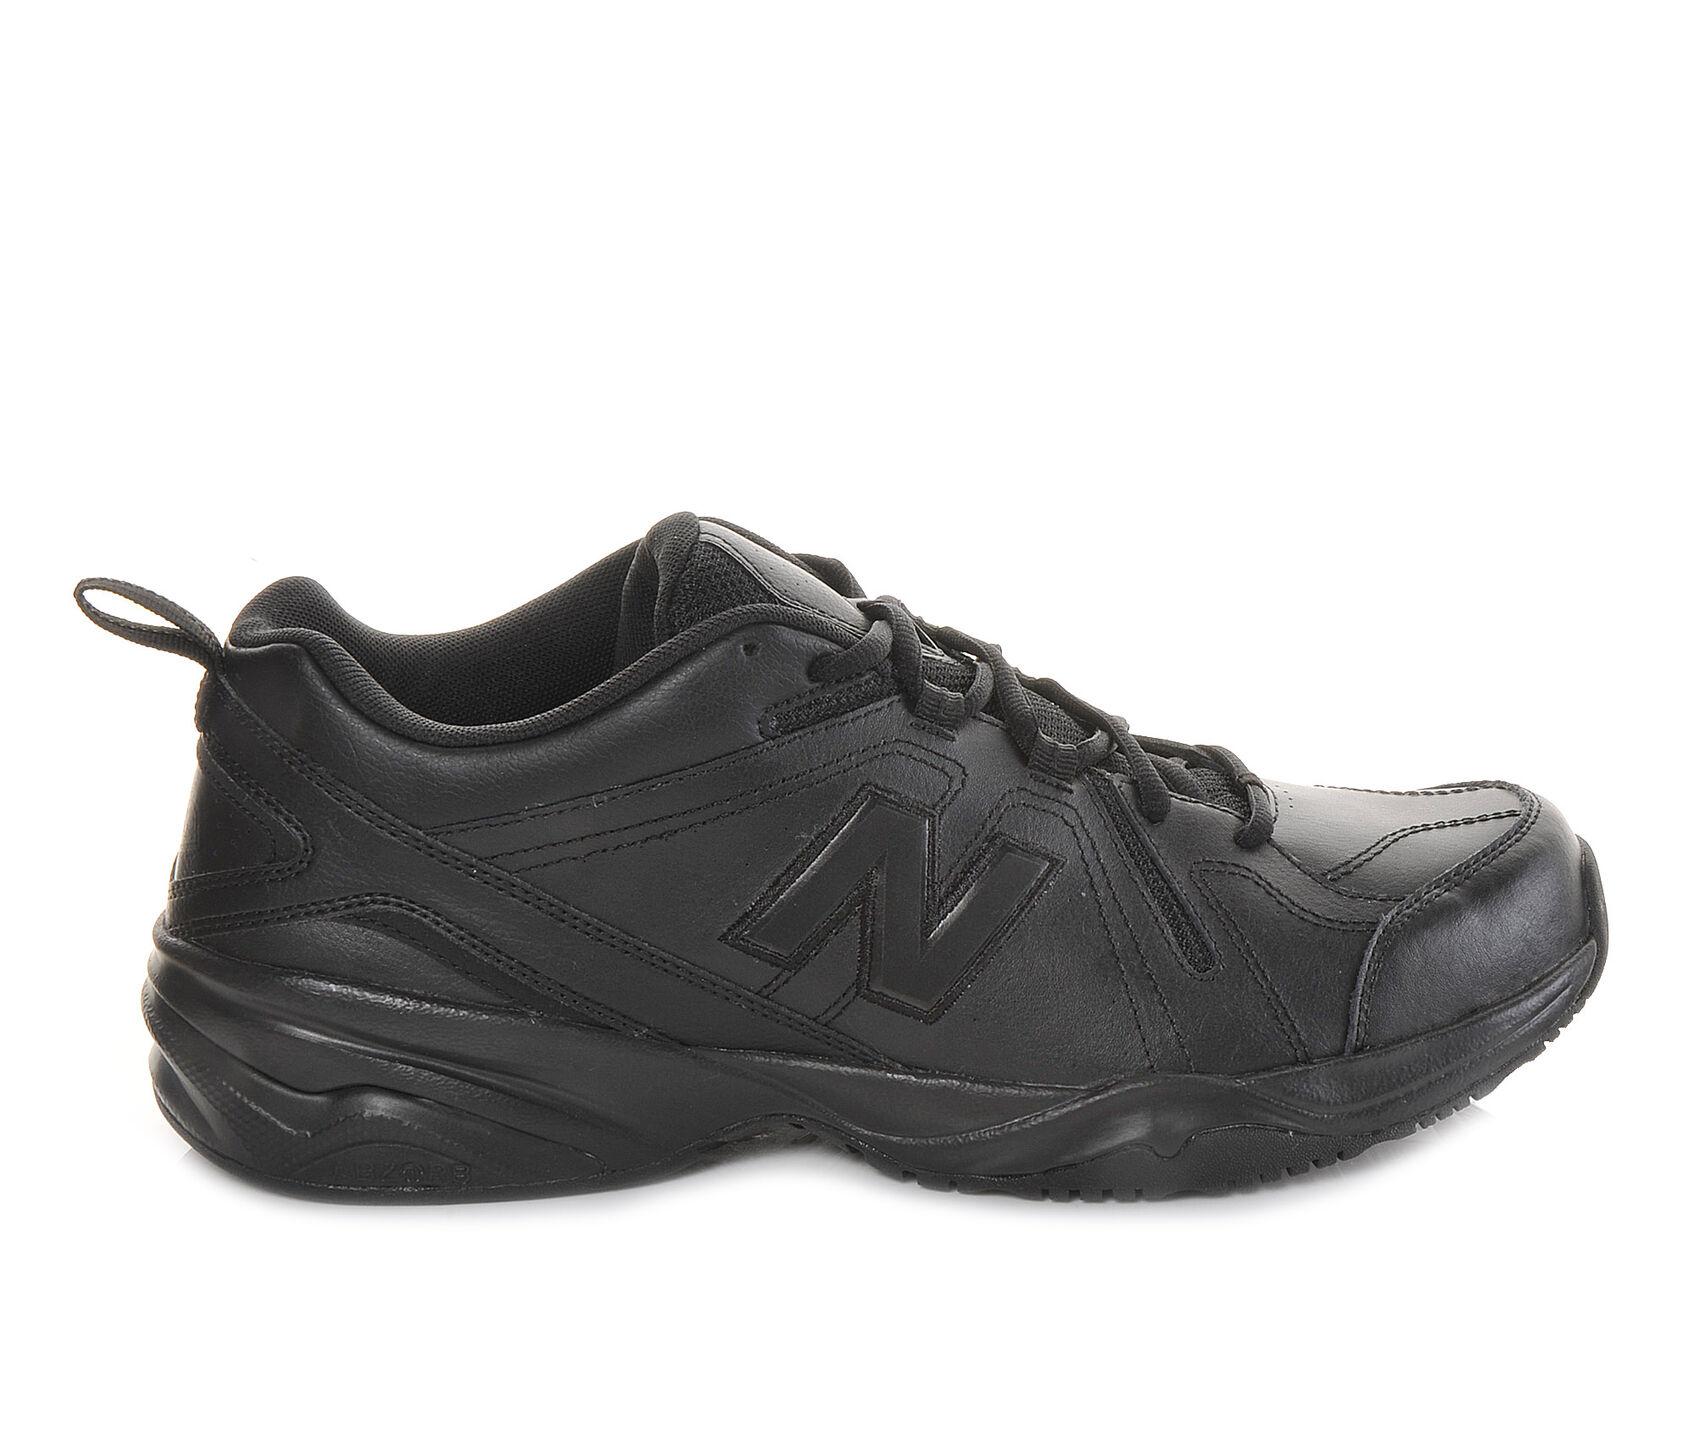 mens new balance training shoes. mens new balance training shoes